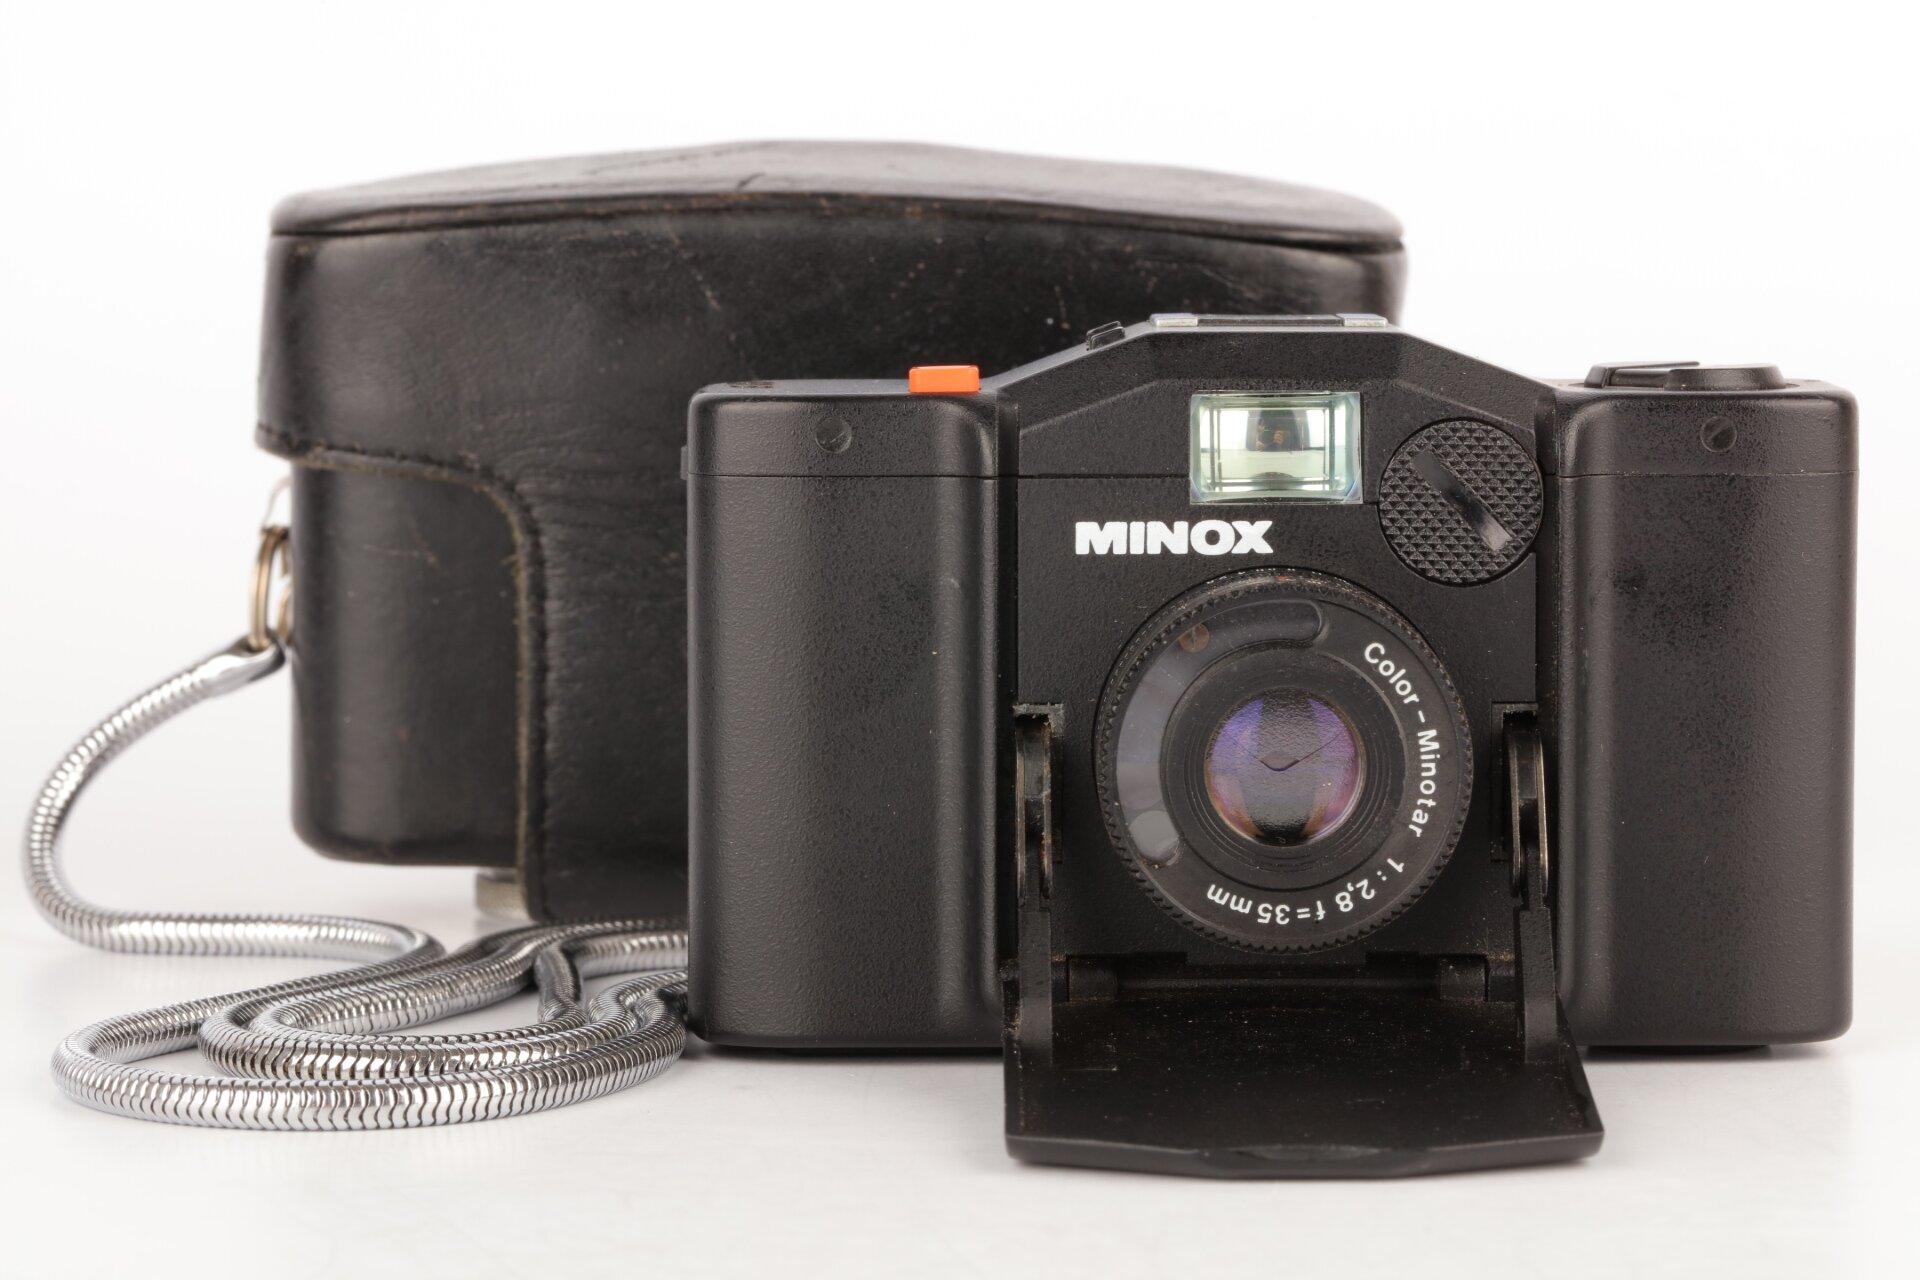 Minox 35 GL mit Color-Minotar 2,8/35 mm